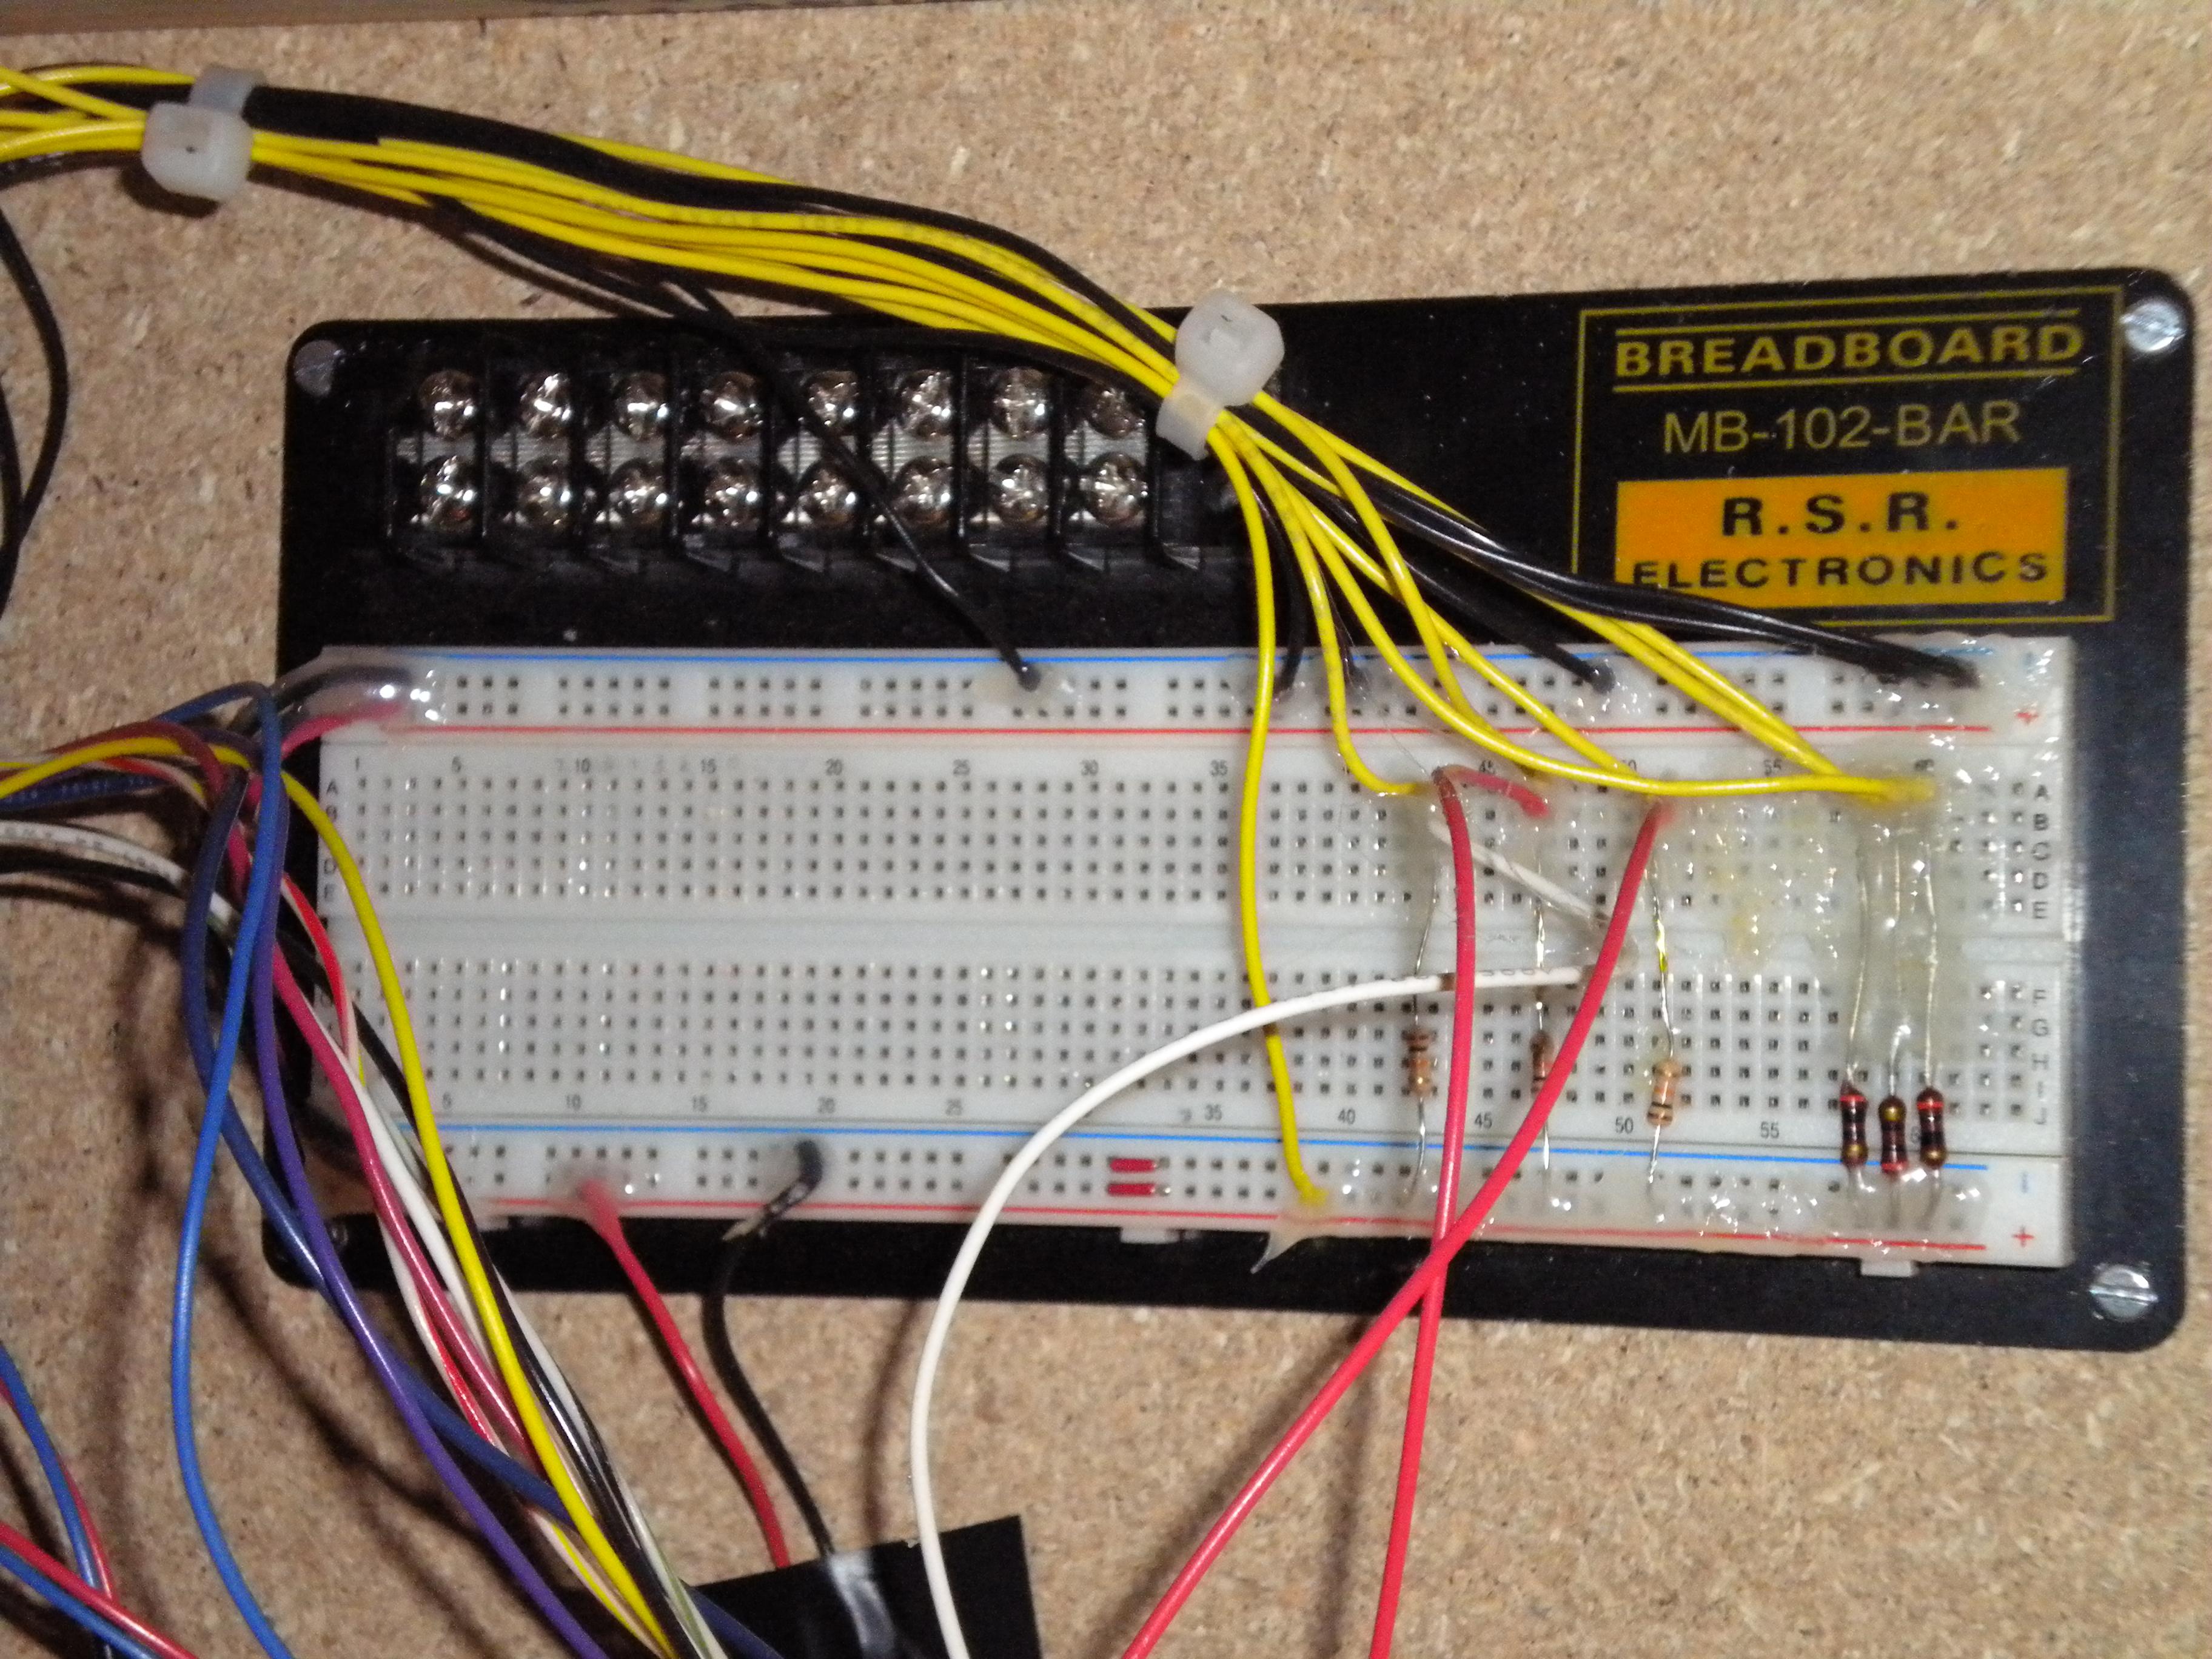 Jon Schwarzs Lab Notebook 5v 10a Regulator Circuit Switchingregulatorcircuit Power Figure 42820105 Breadboard With Ir Transmitter Reciever Right And Pushbutton Center Interfaces